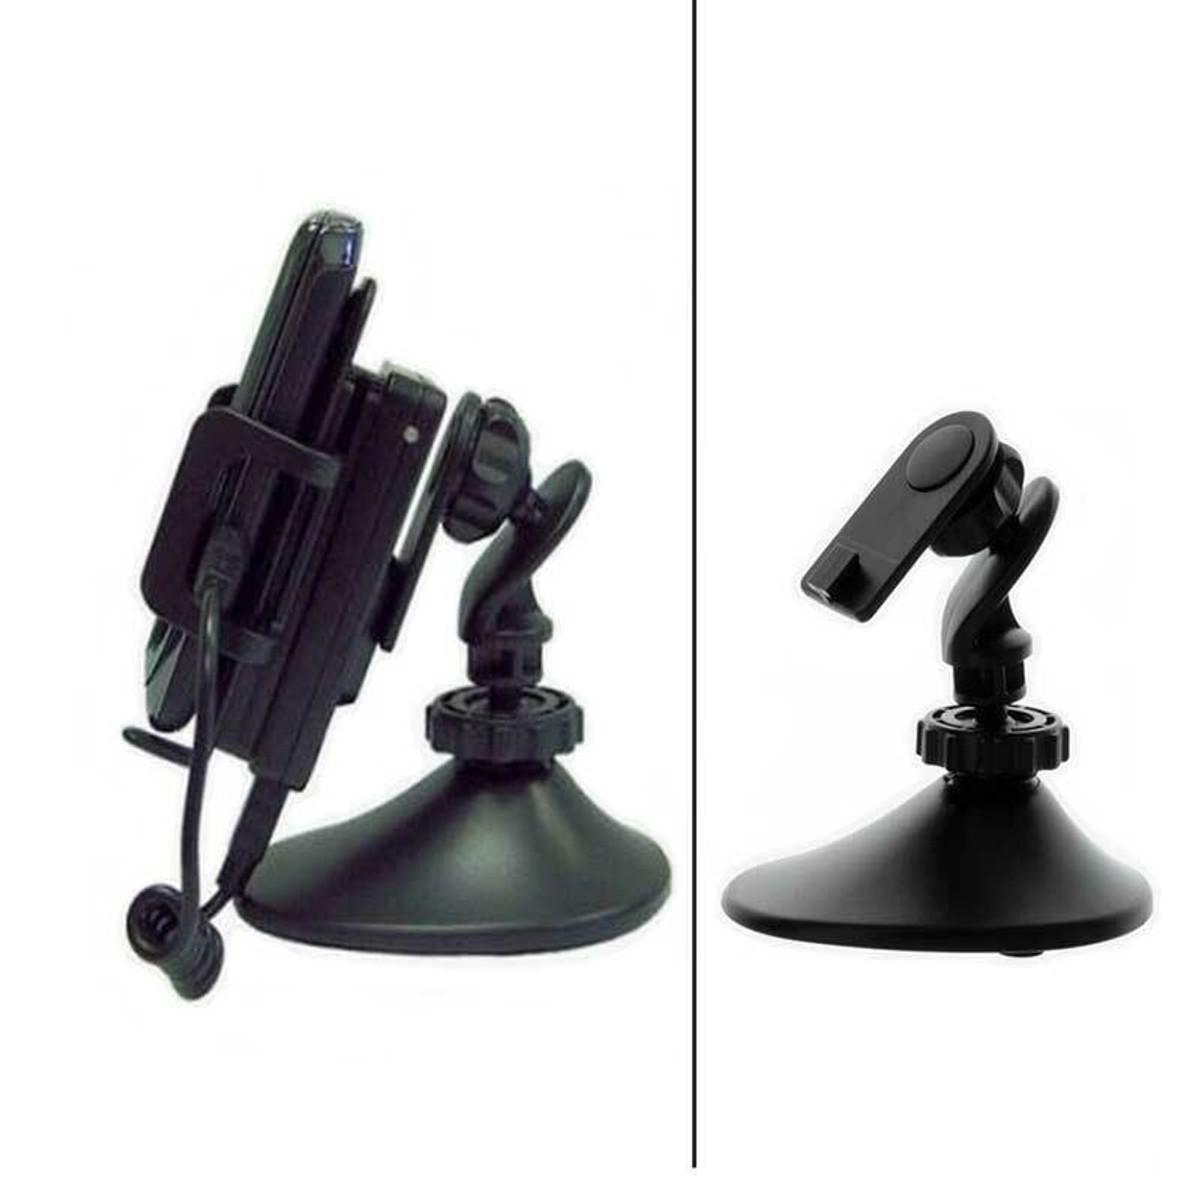 Wilson Electronics weBoost Wilson 901137 Adjustable Desk Mount for all Cradles